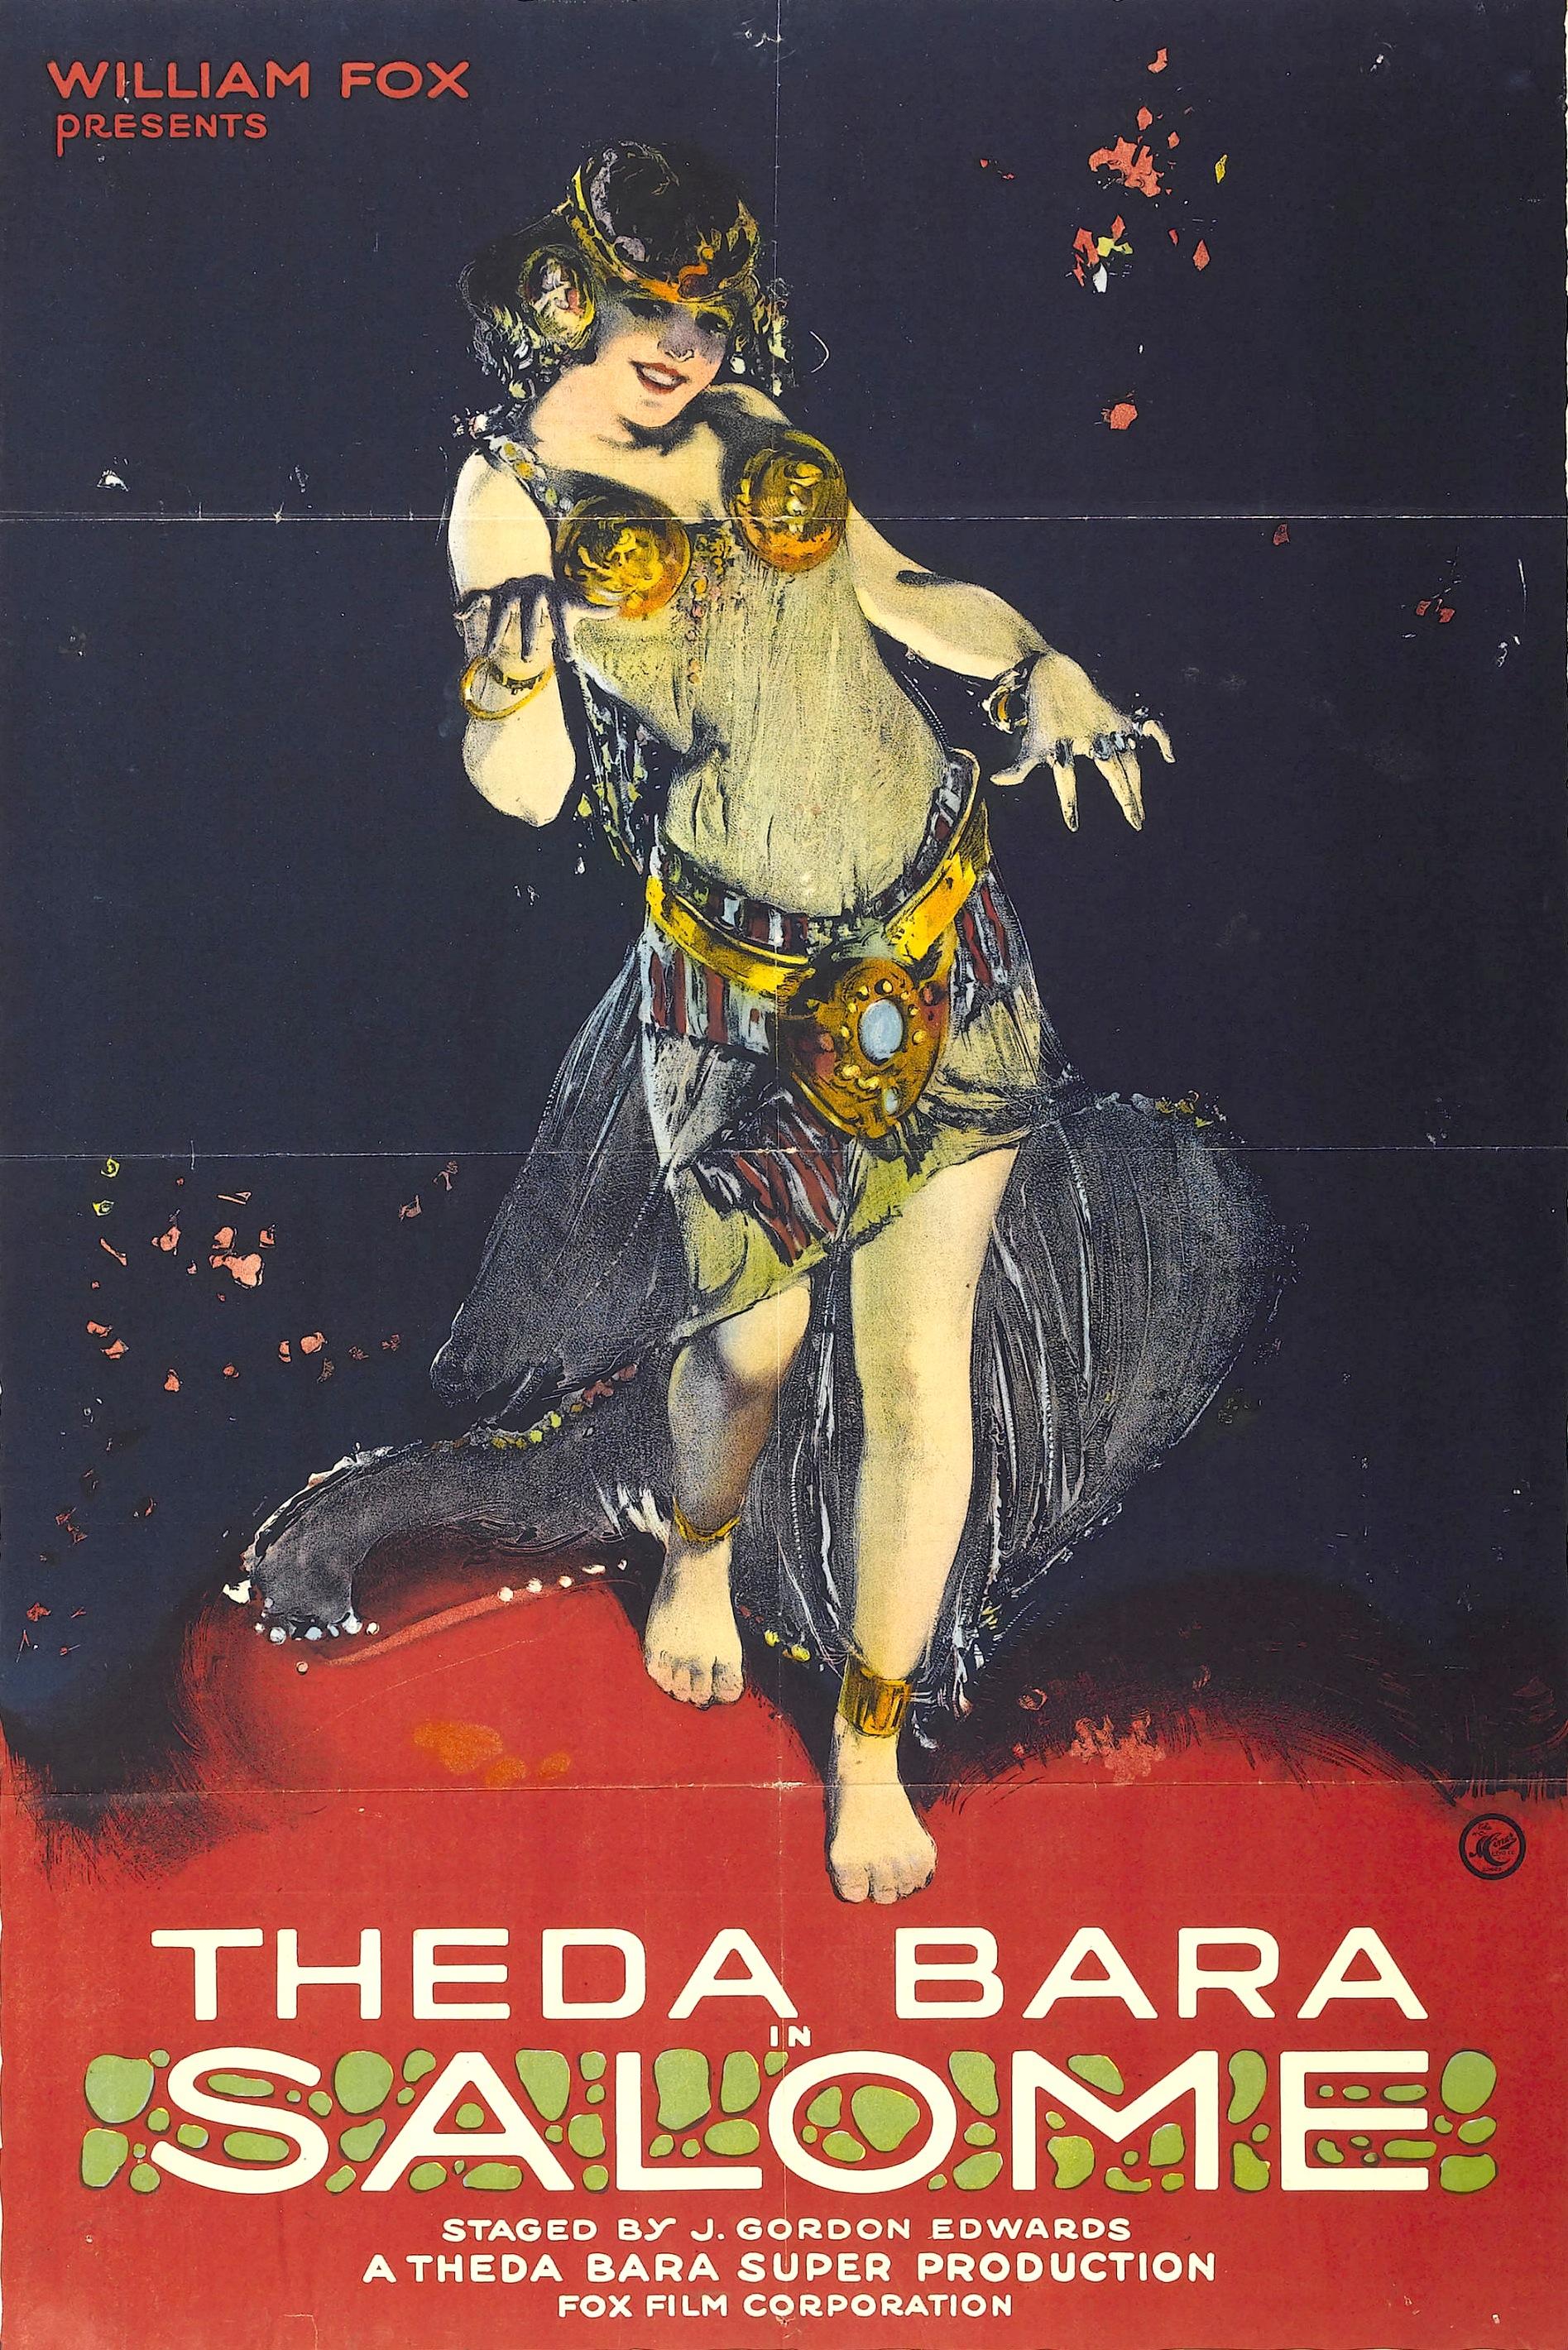 https://upload.wikimedia.org/wikipedia/commons/d/db/Salome%2C_1918_-_Poster2.jpg